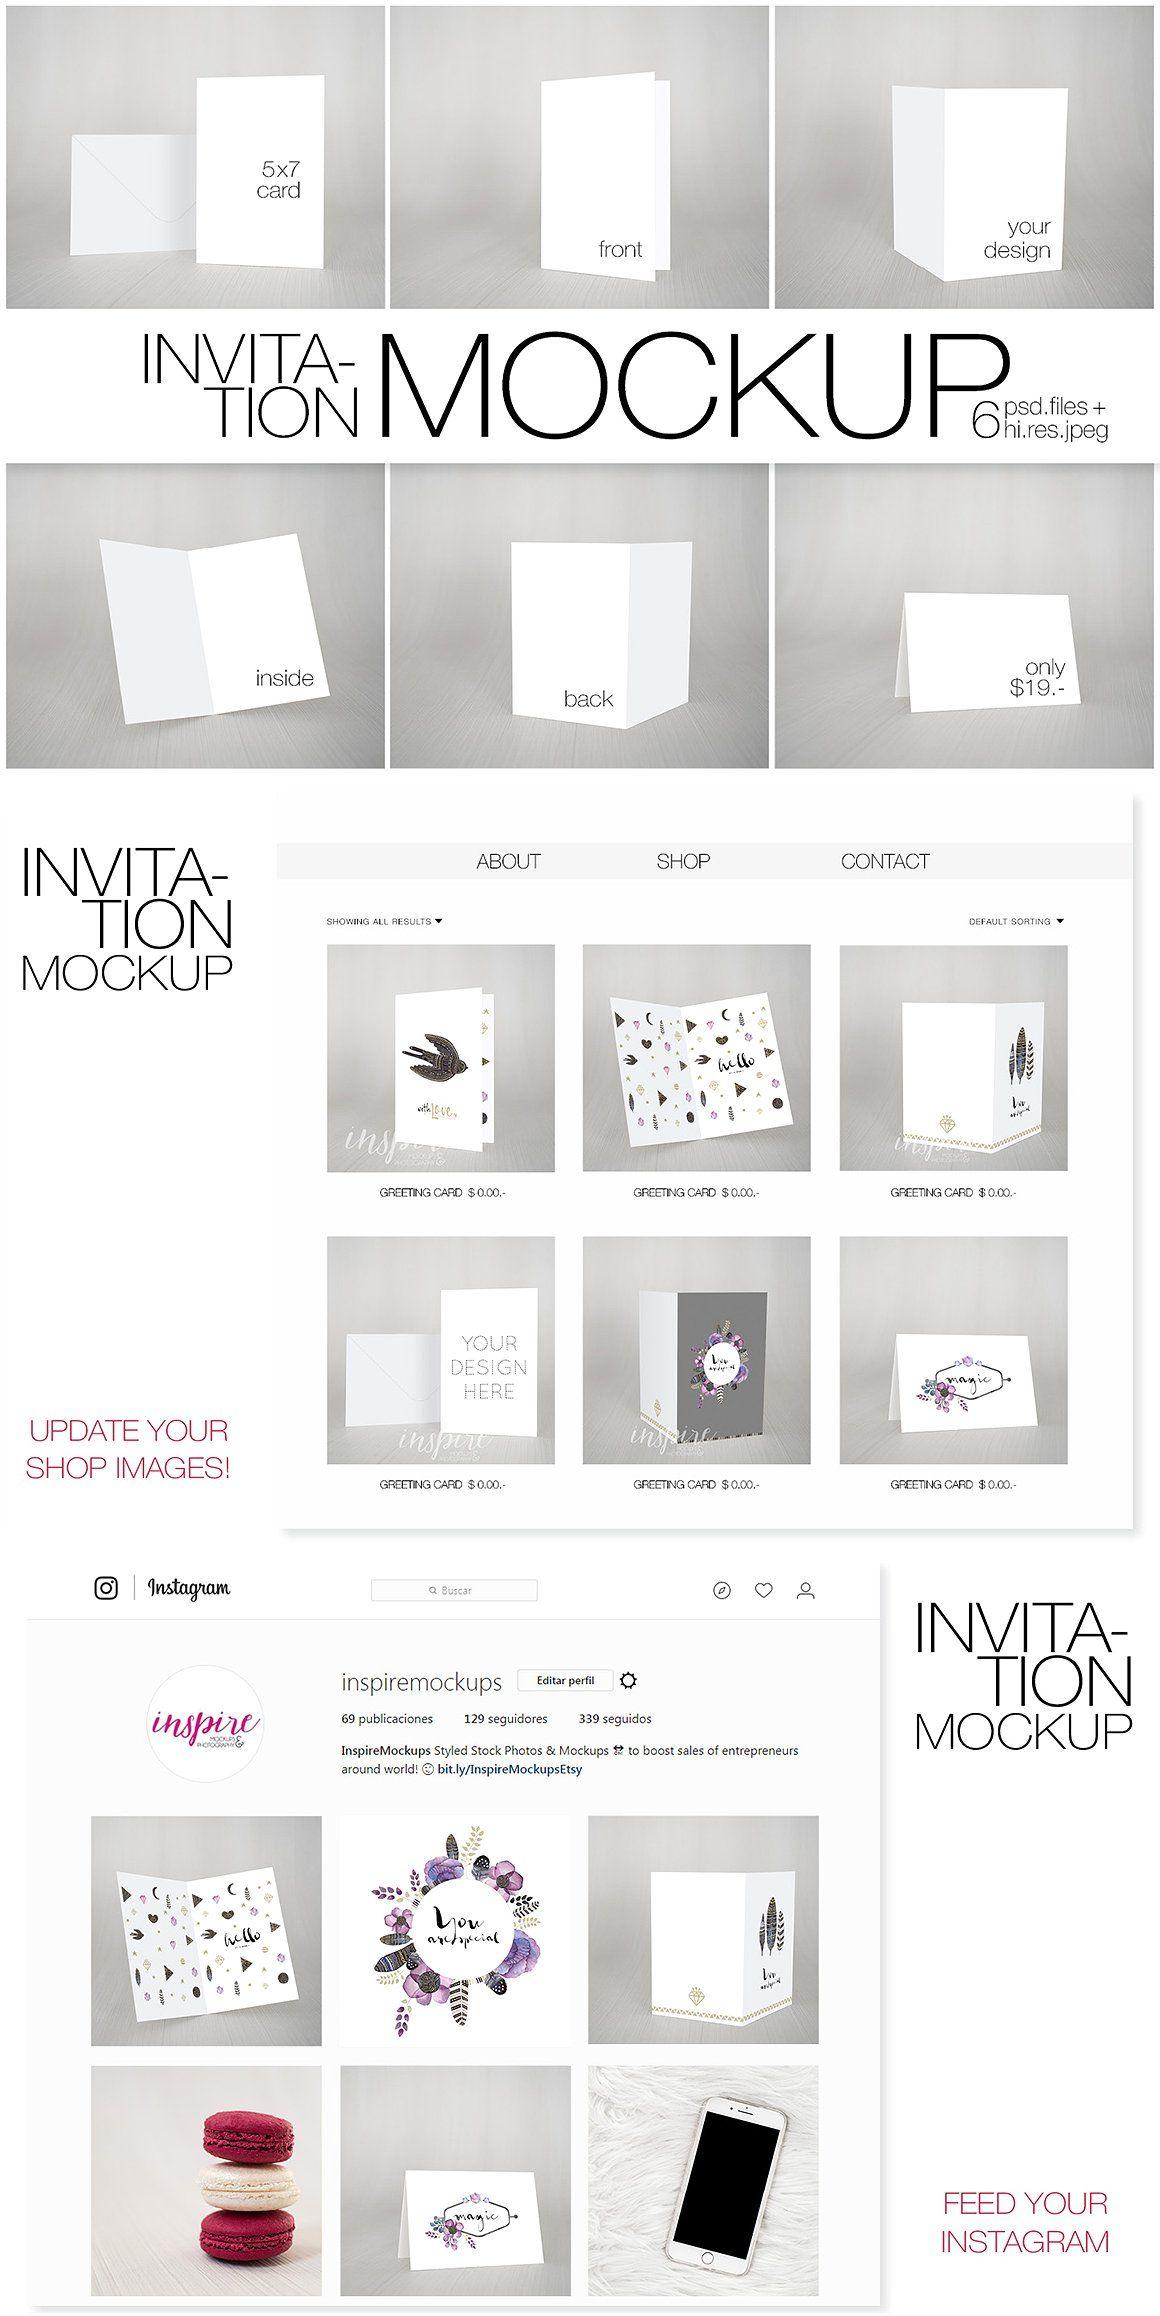 5x7 Card Invitation Nordic Mockup Objectsmartinsert